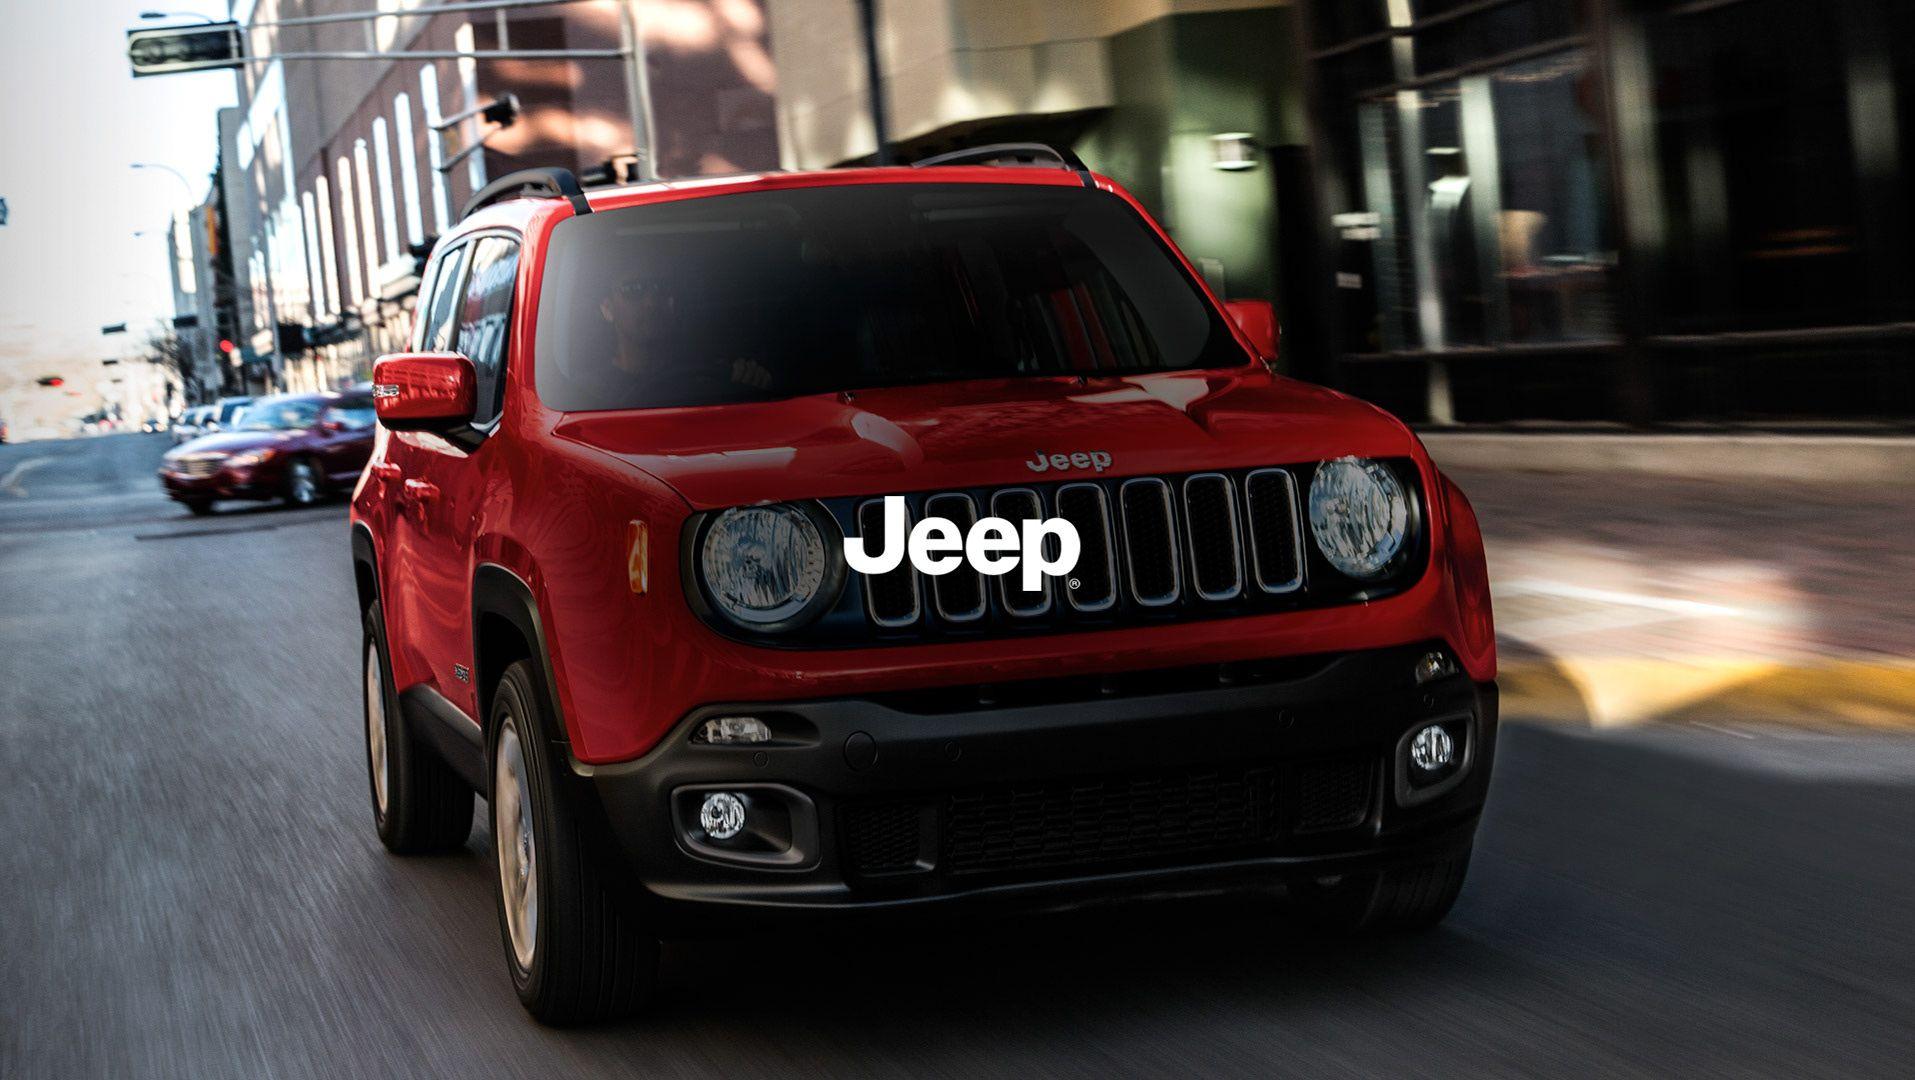 Plano Next Jeep Recompra Garantida O Que E Como Funciona Como Conseguir Jeep Carros Diesel